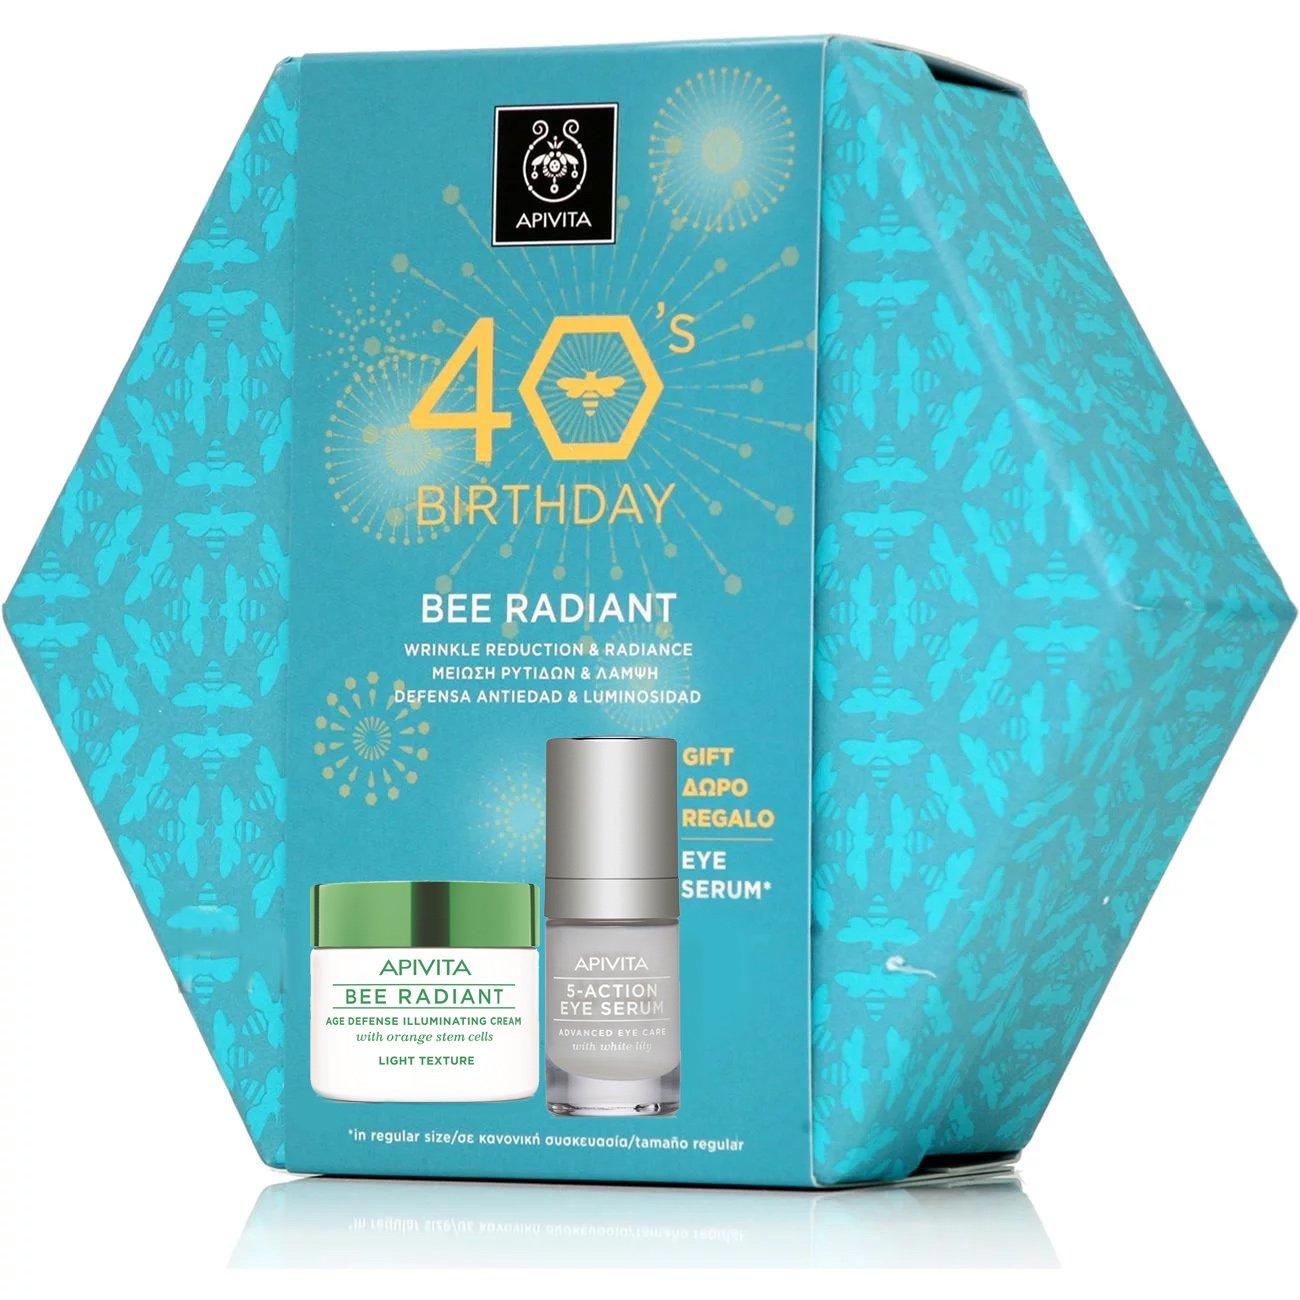 Apivita Πακέτο Προσφοράς 40years Bee Radiant Cream, Light Texture 50ml & Δώρο 5- προσφορές   σετ περιποίησης προσώπου   σετ αντιγήρανσης και σύσφιξης